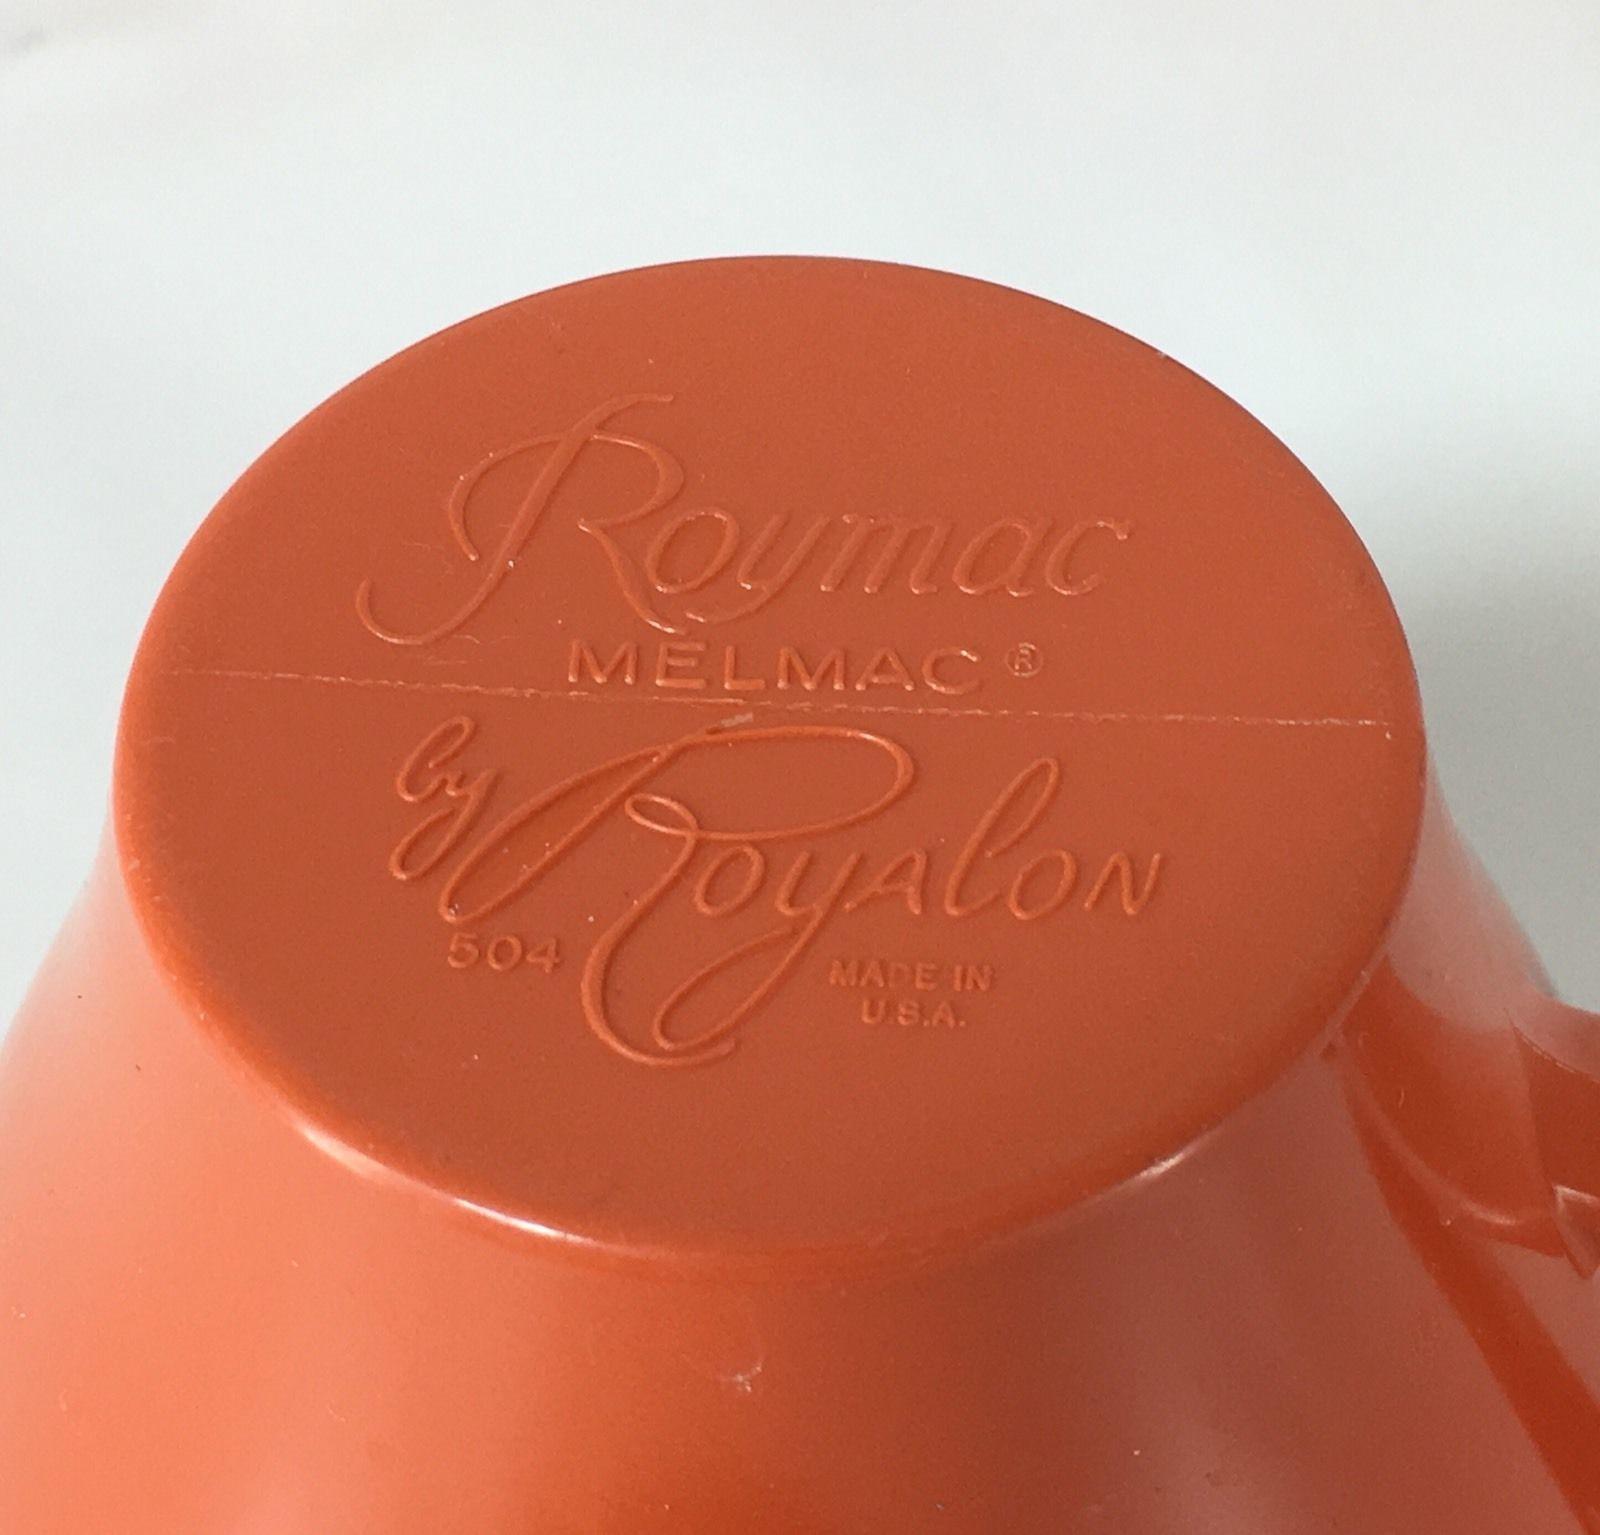 Vintage Royalon Roymac Melmac Coffee Cups 504 Orange Set of 3 Made In The USA